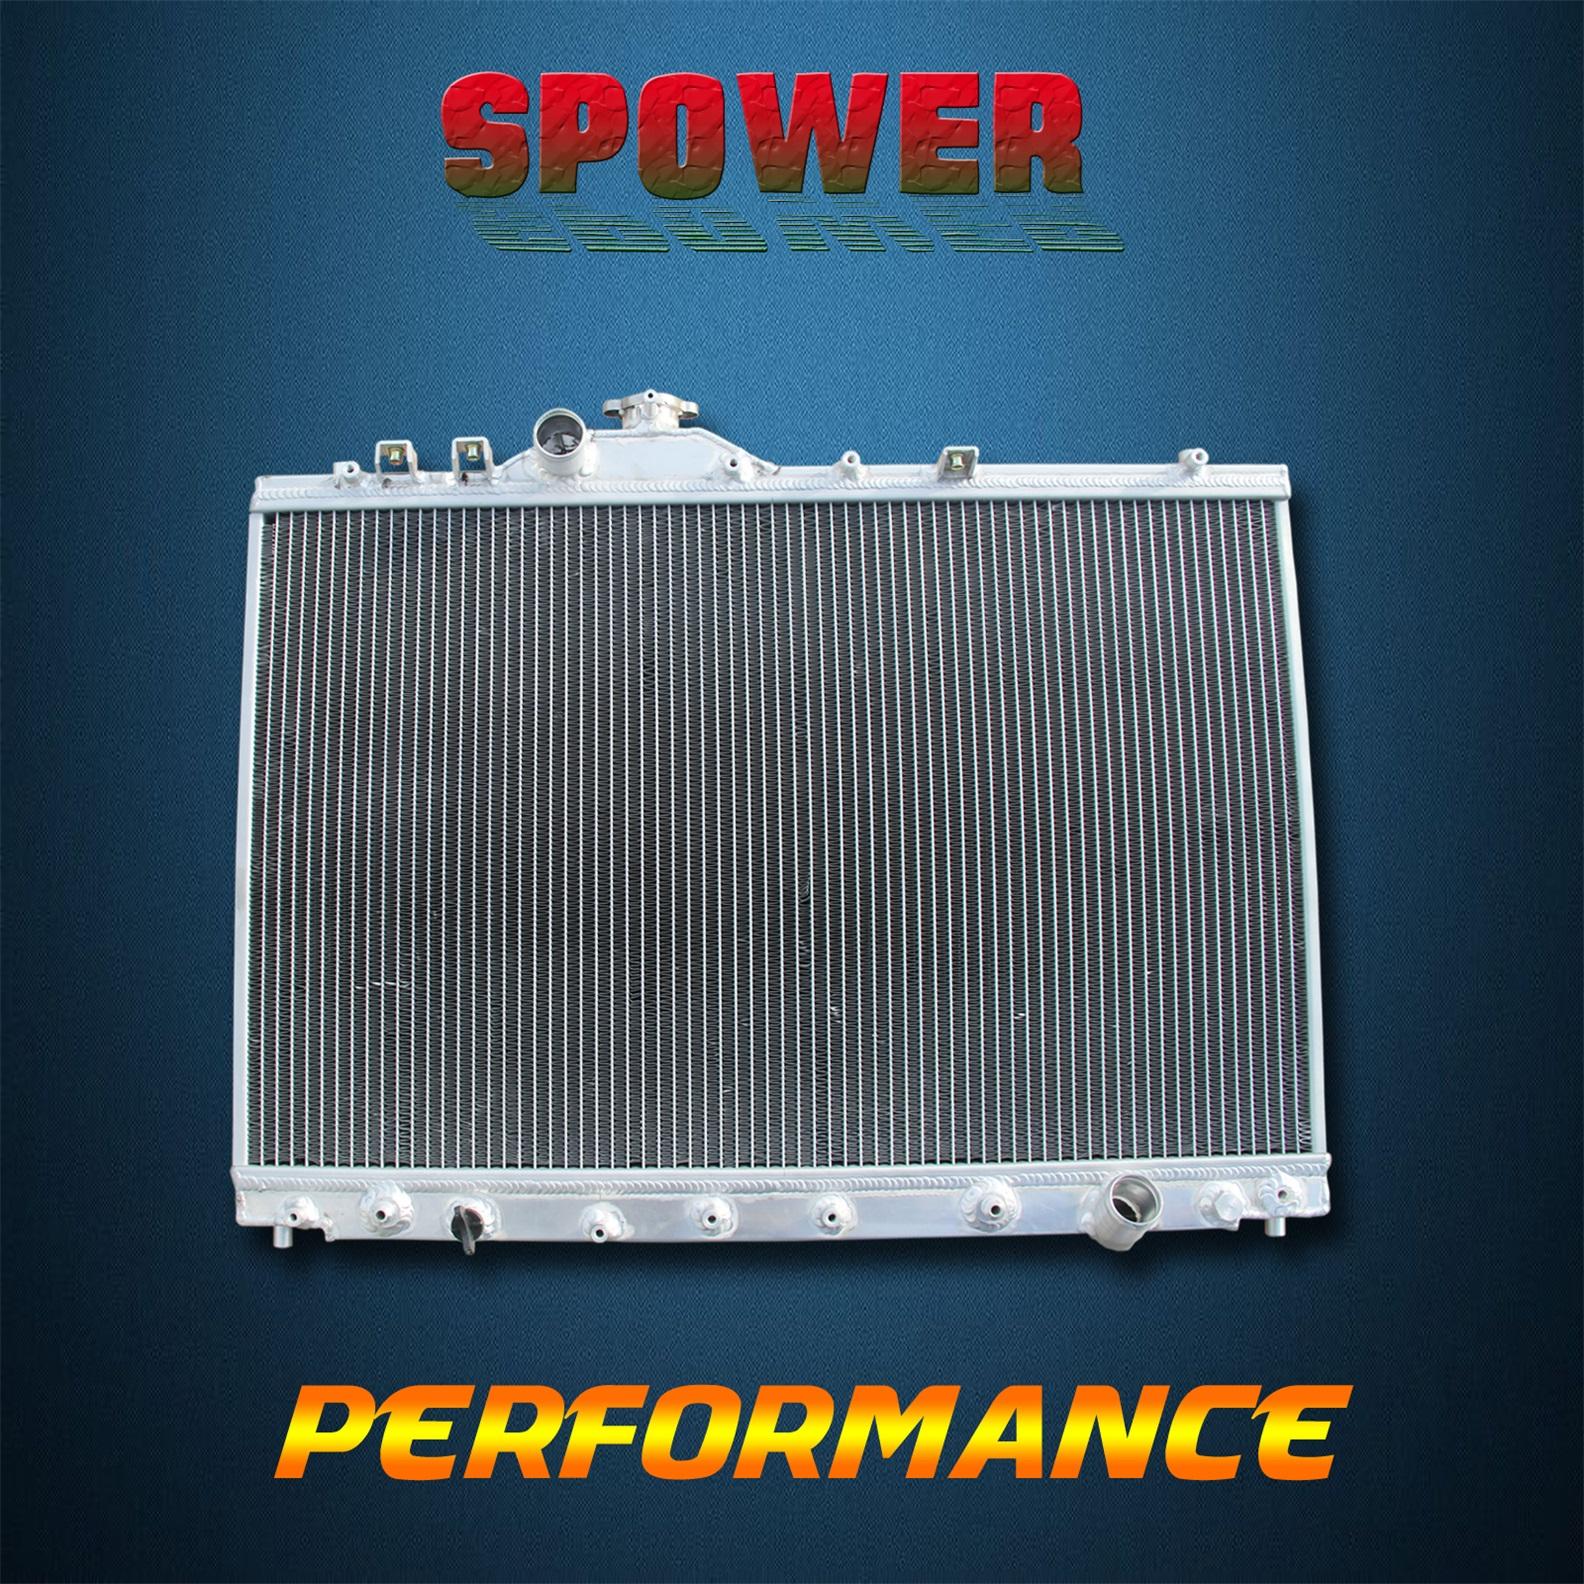 2Row Aluminum Radiator Fit For Saab 9-2X 05-06// Subaru Baja 04-06 Impreza 03-07